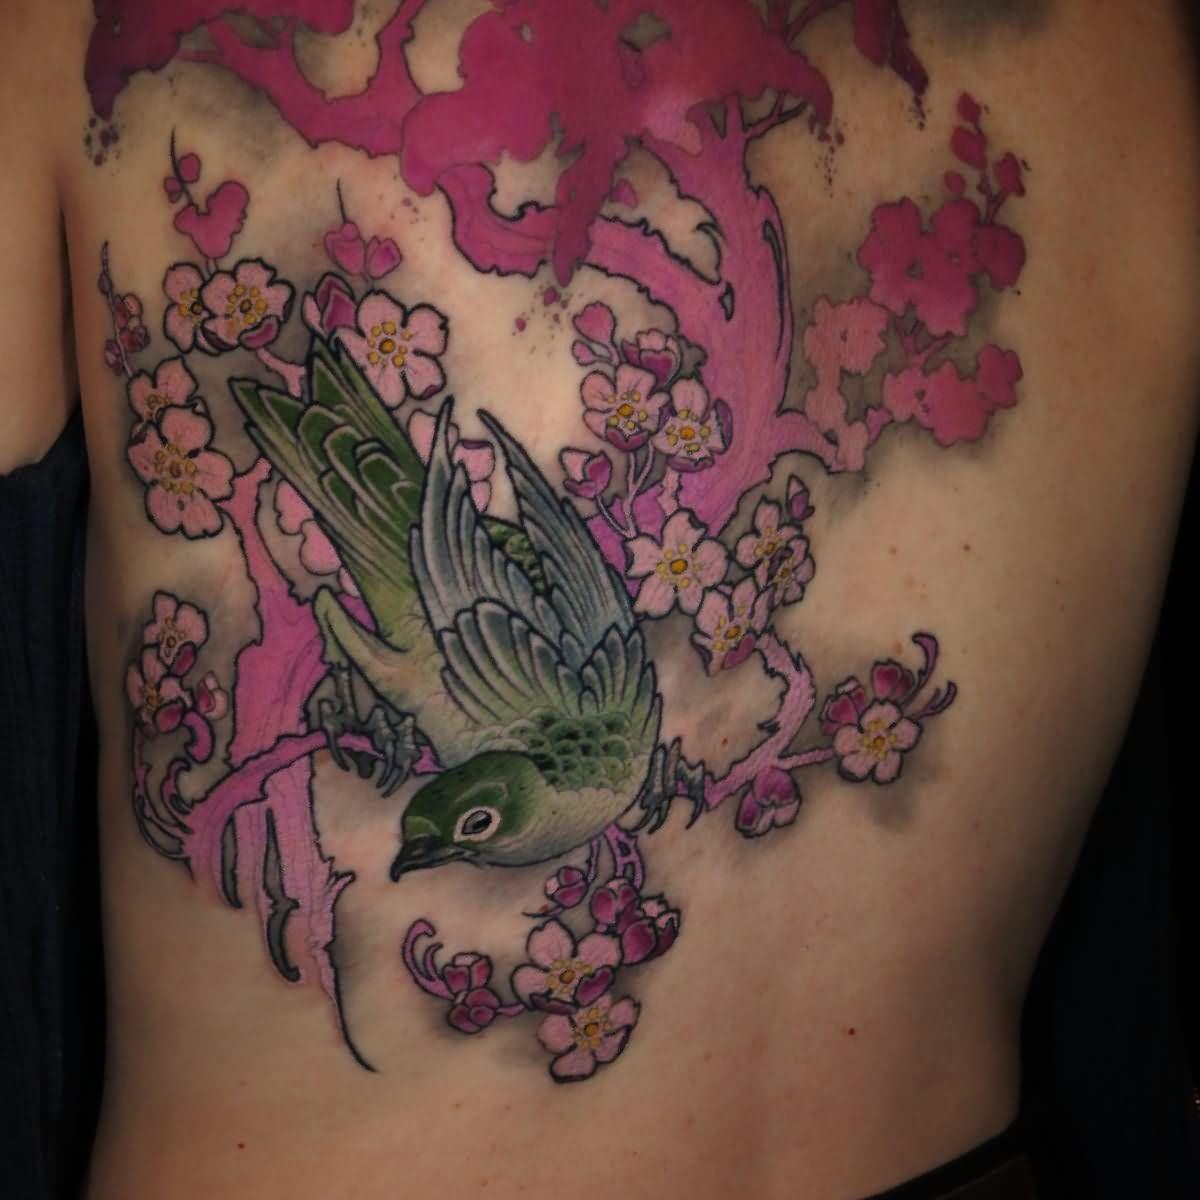 Bird on branch tattoo